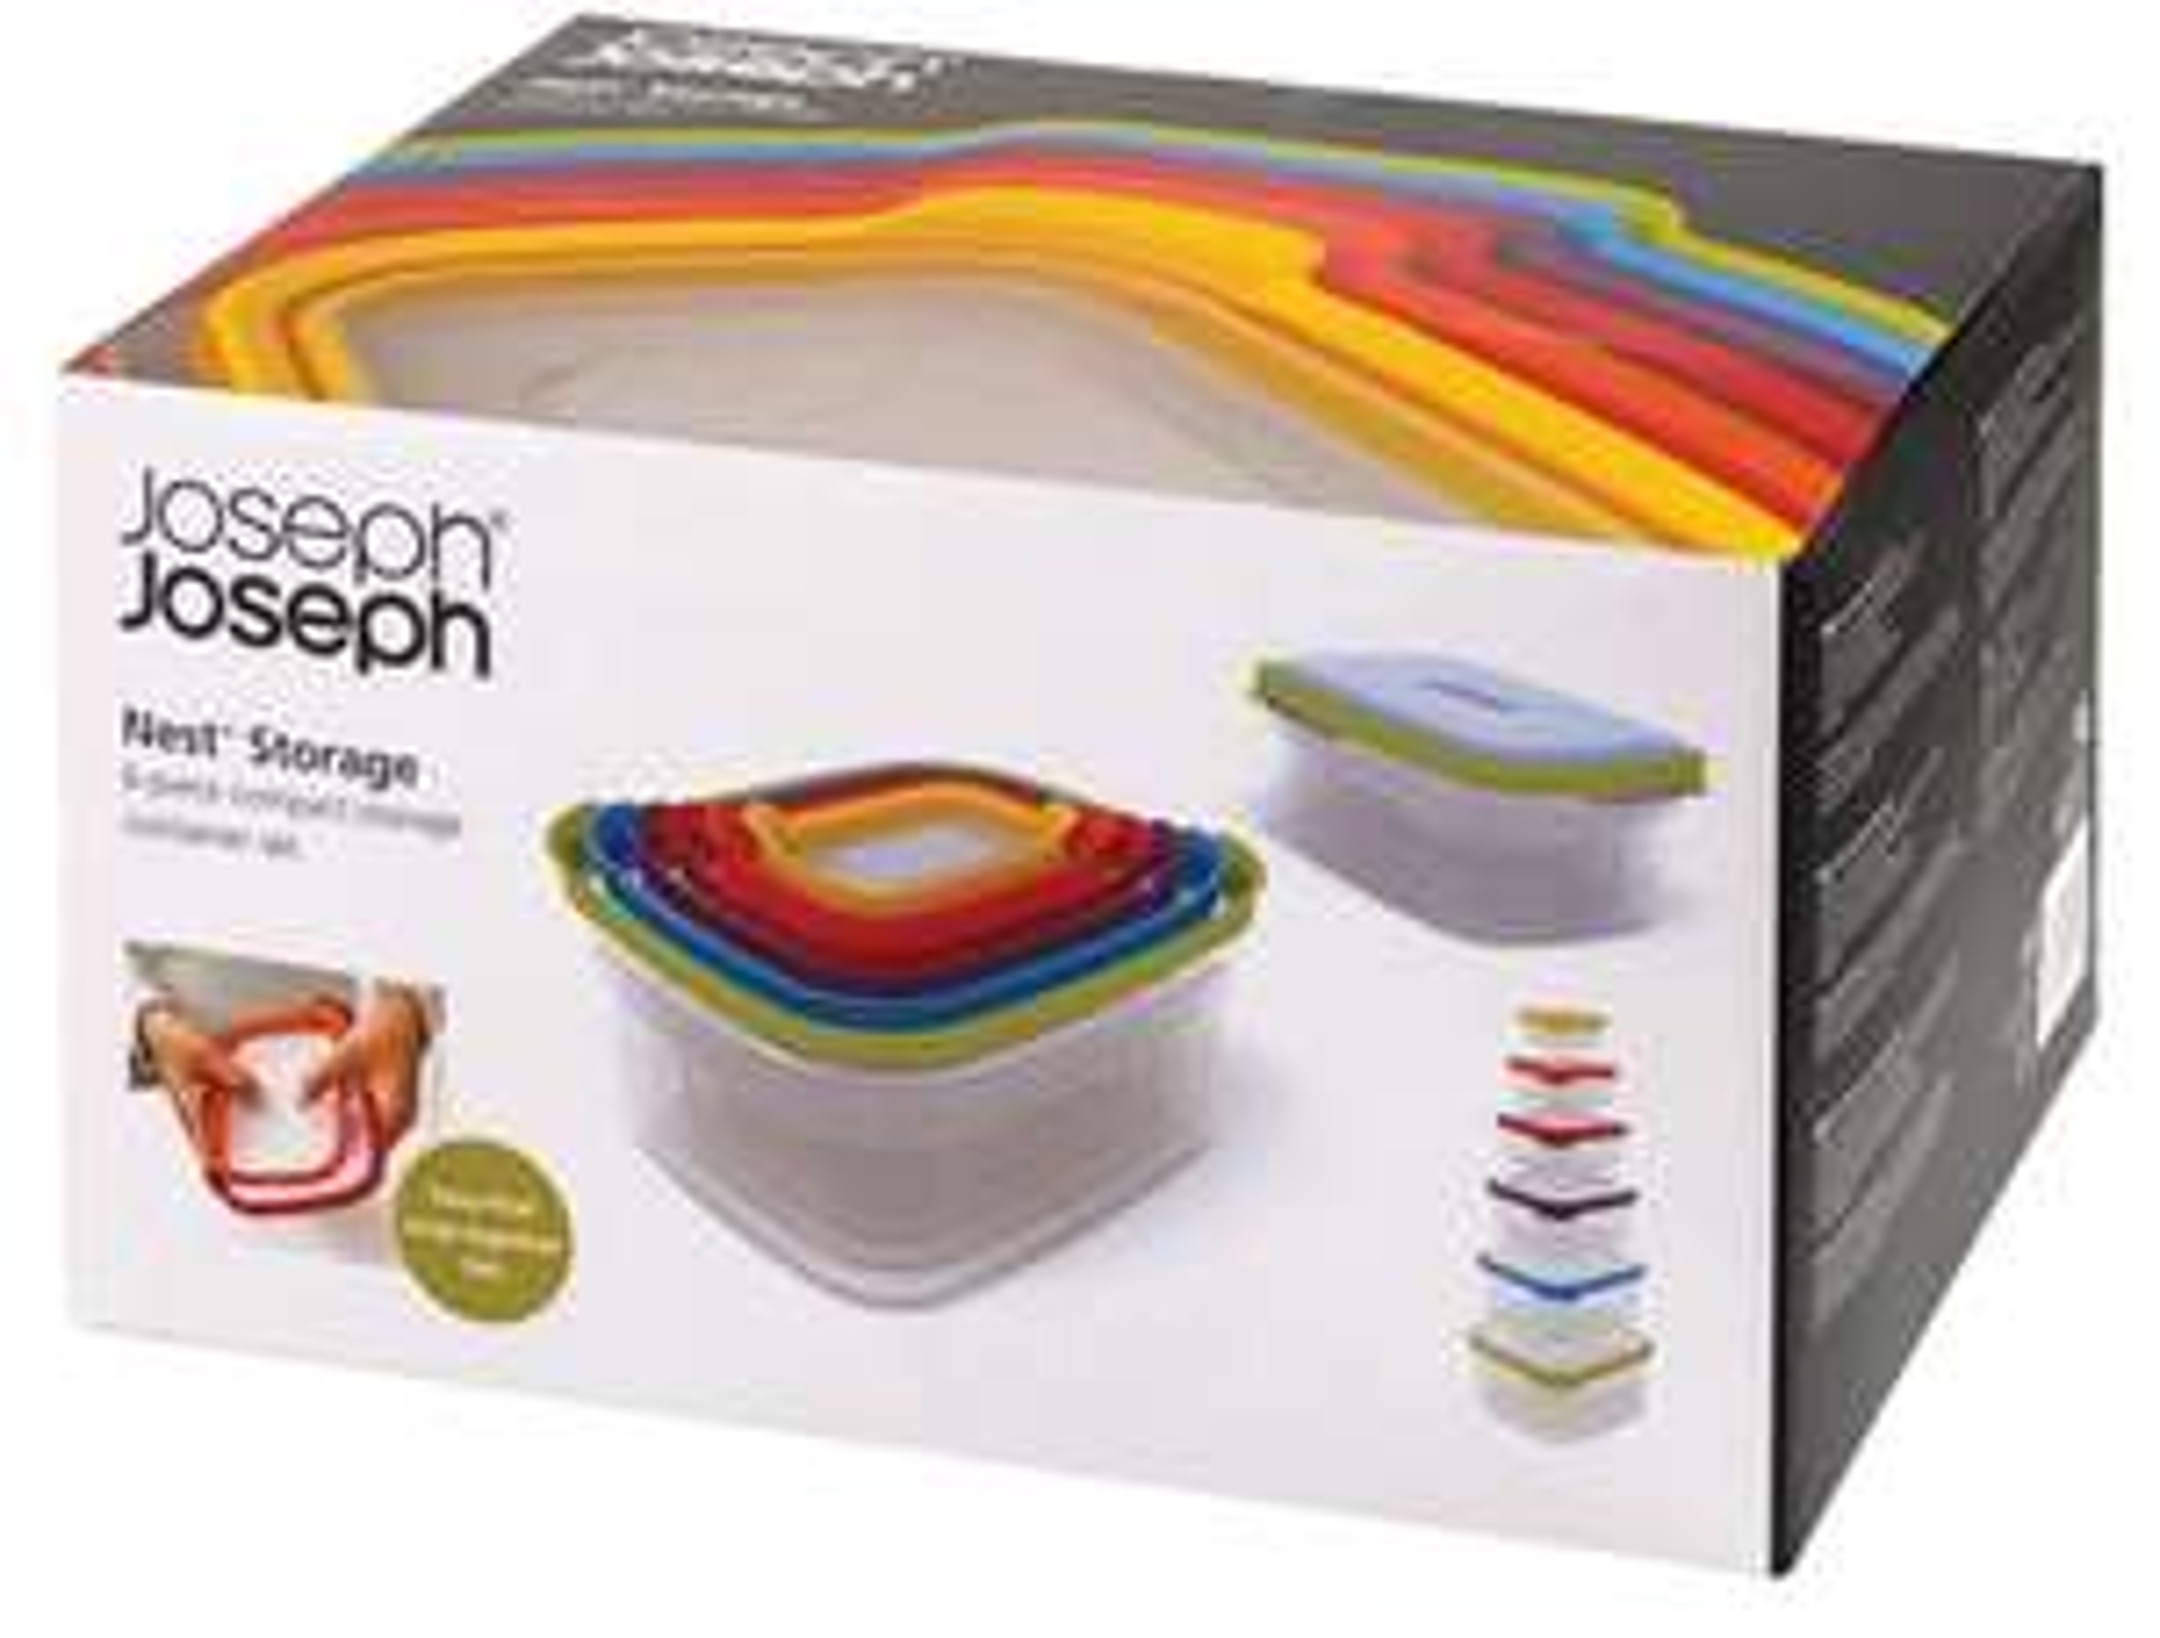 Joseph Joseph - Set of 6 Multi-Coloured 'Nest Storage' Compact Food Containers at Debenhams for £21